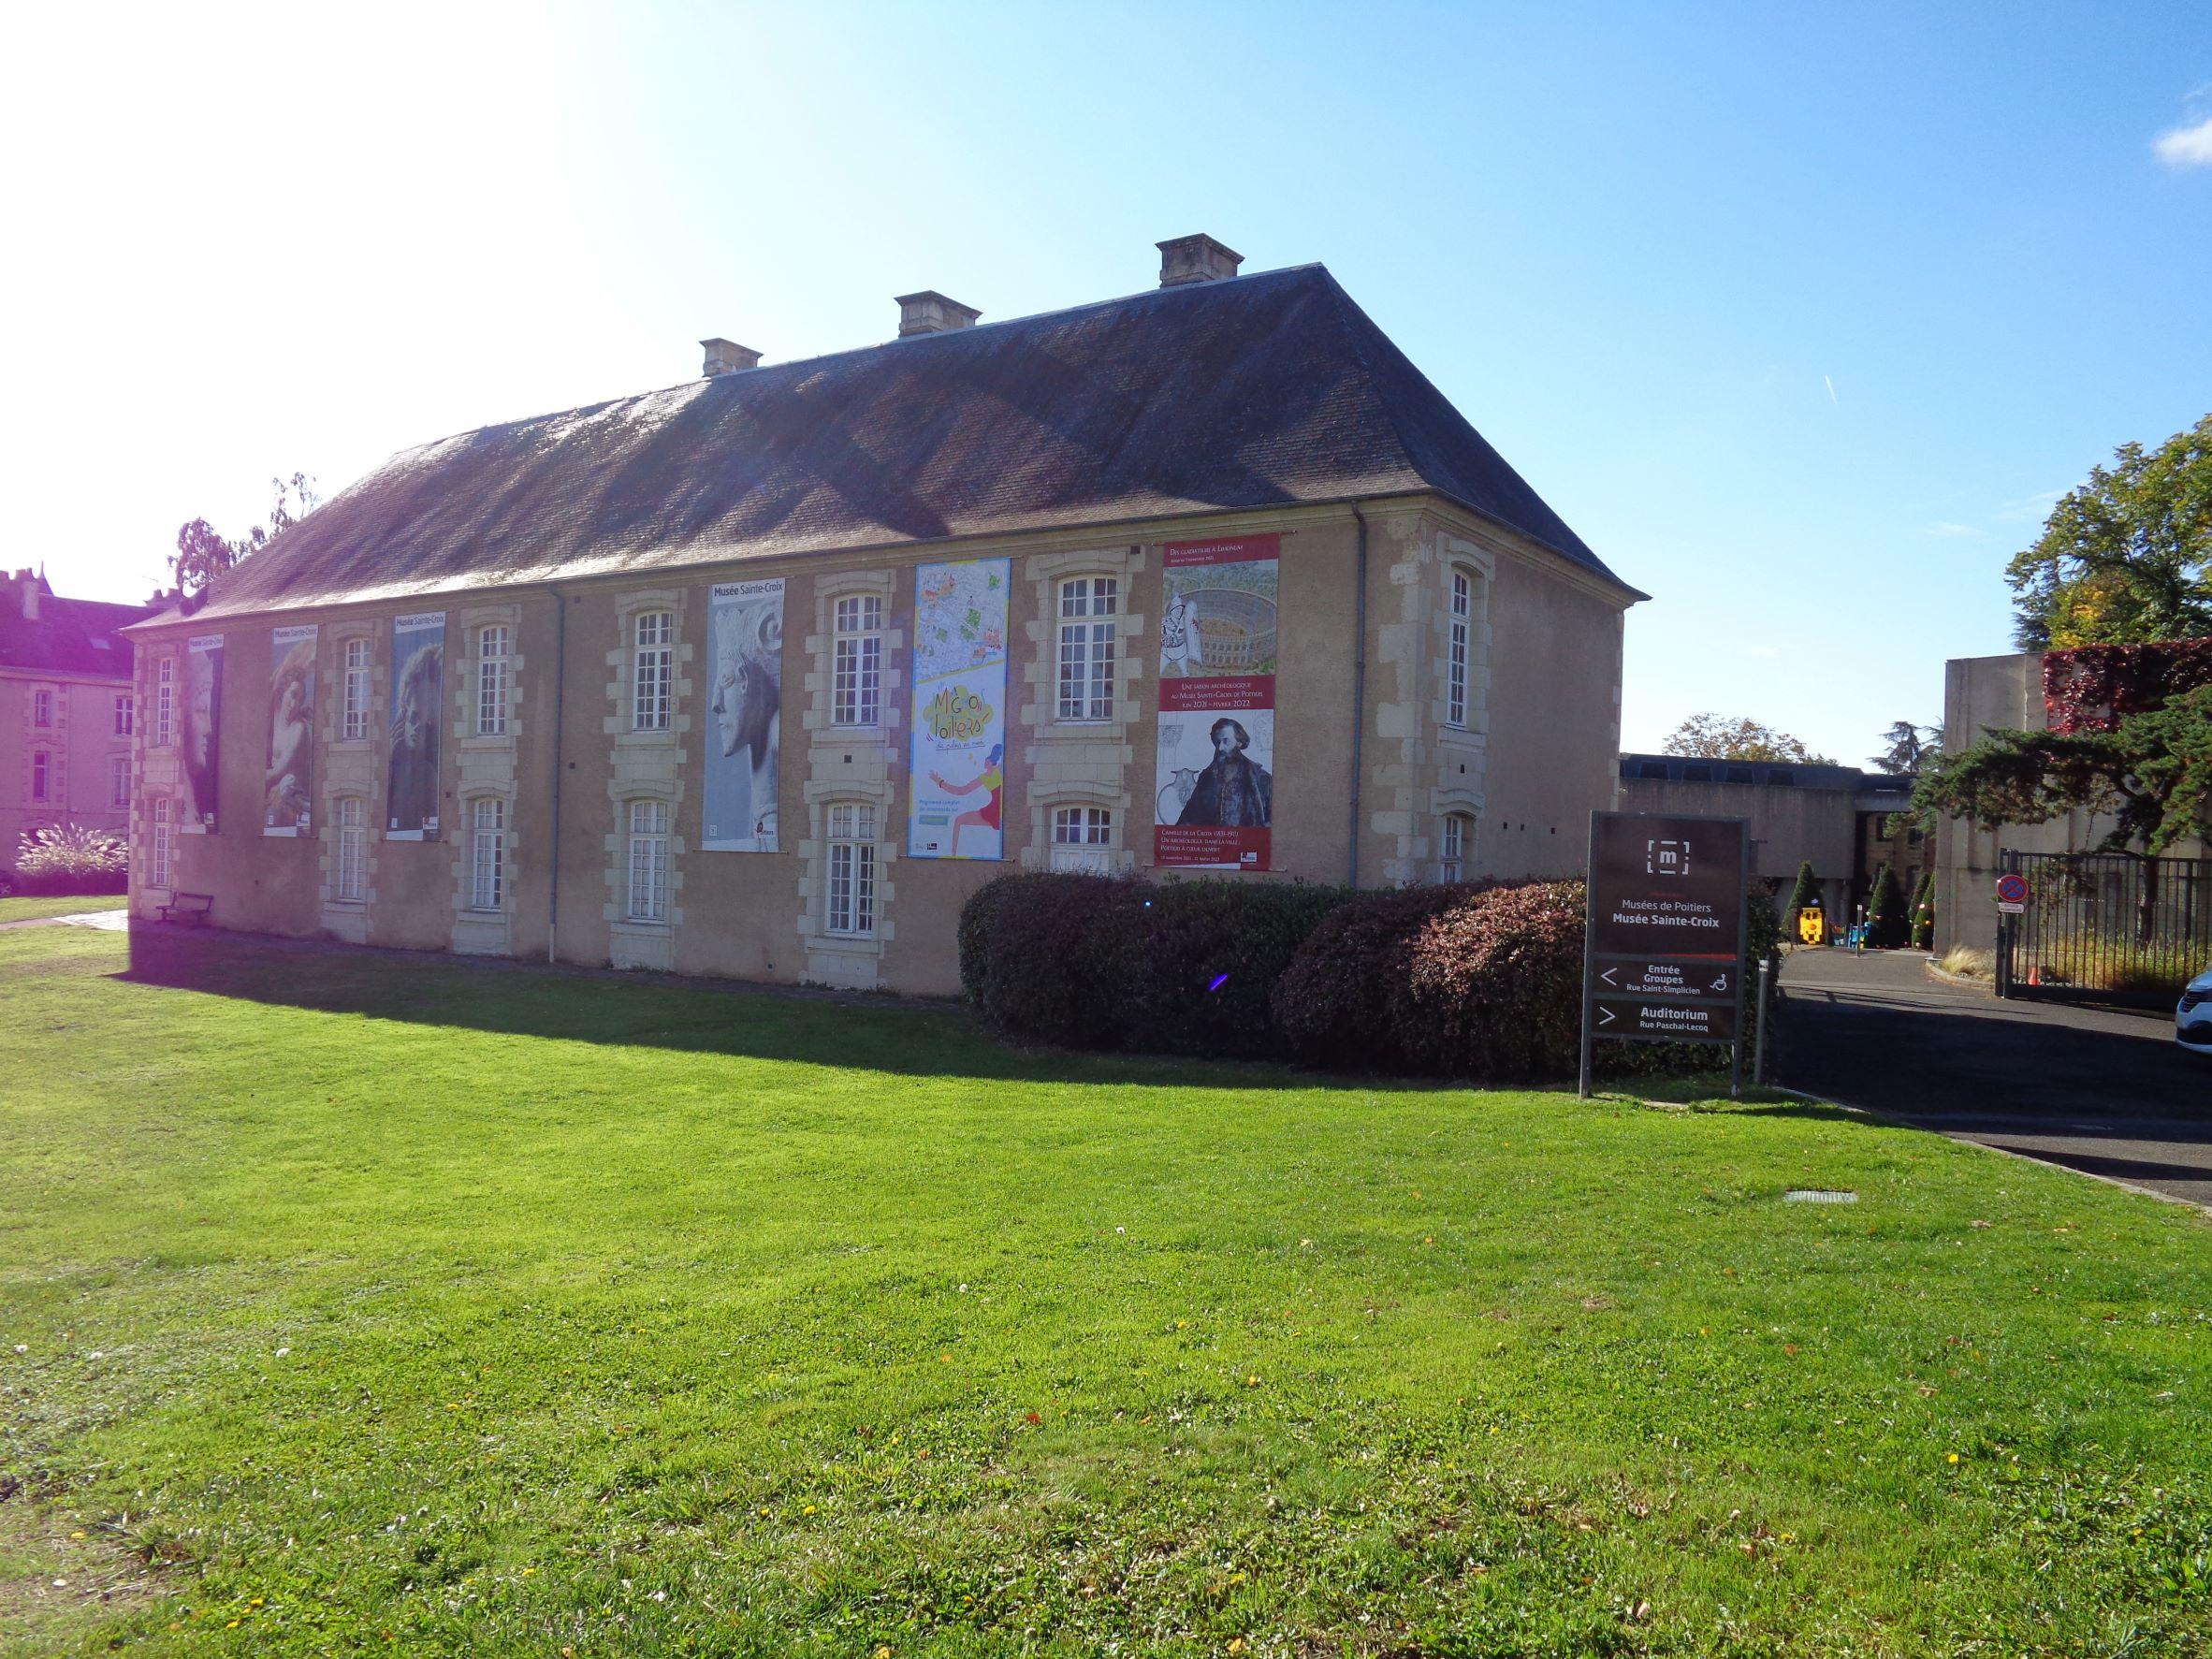 Poitiers mus ste croix front oct21